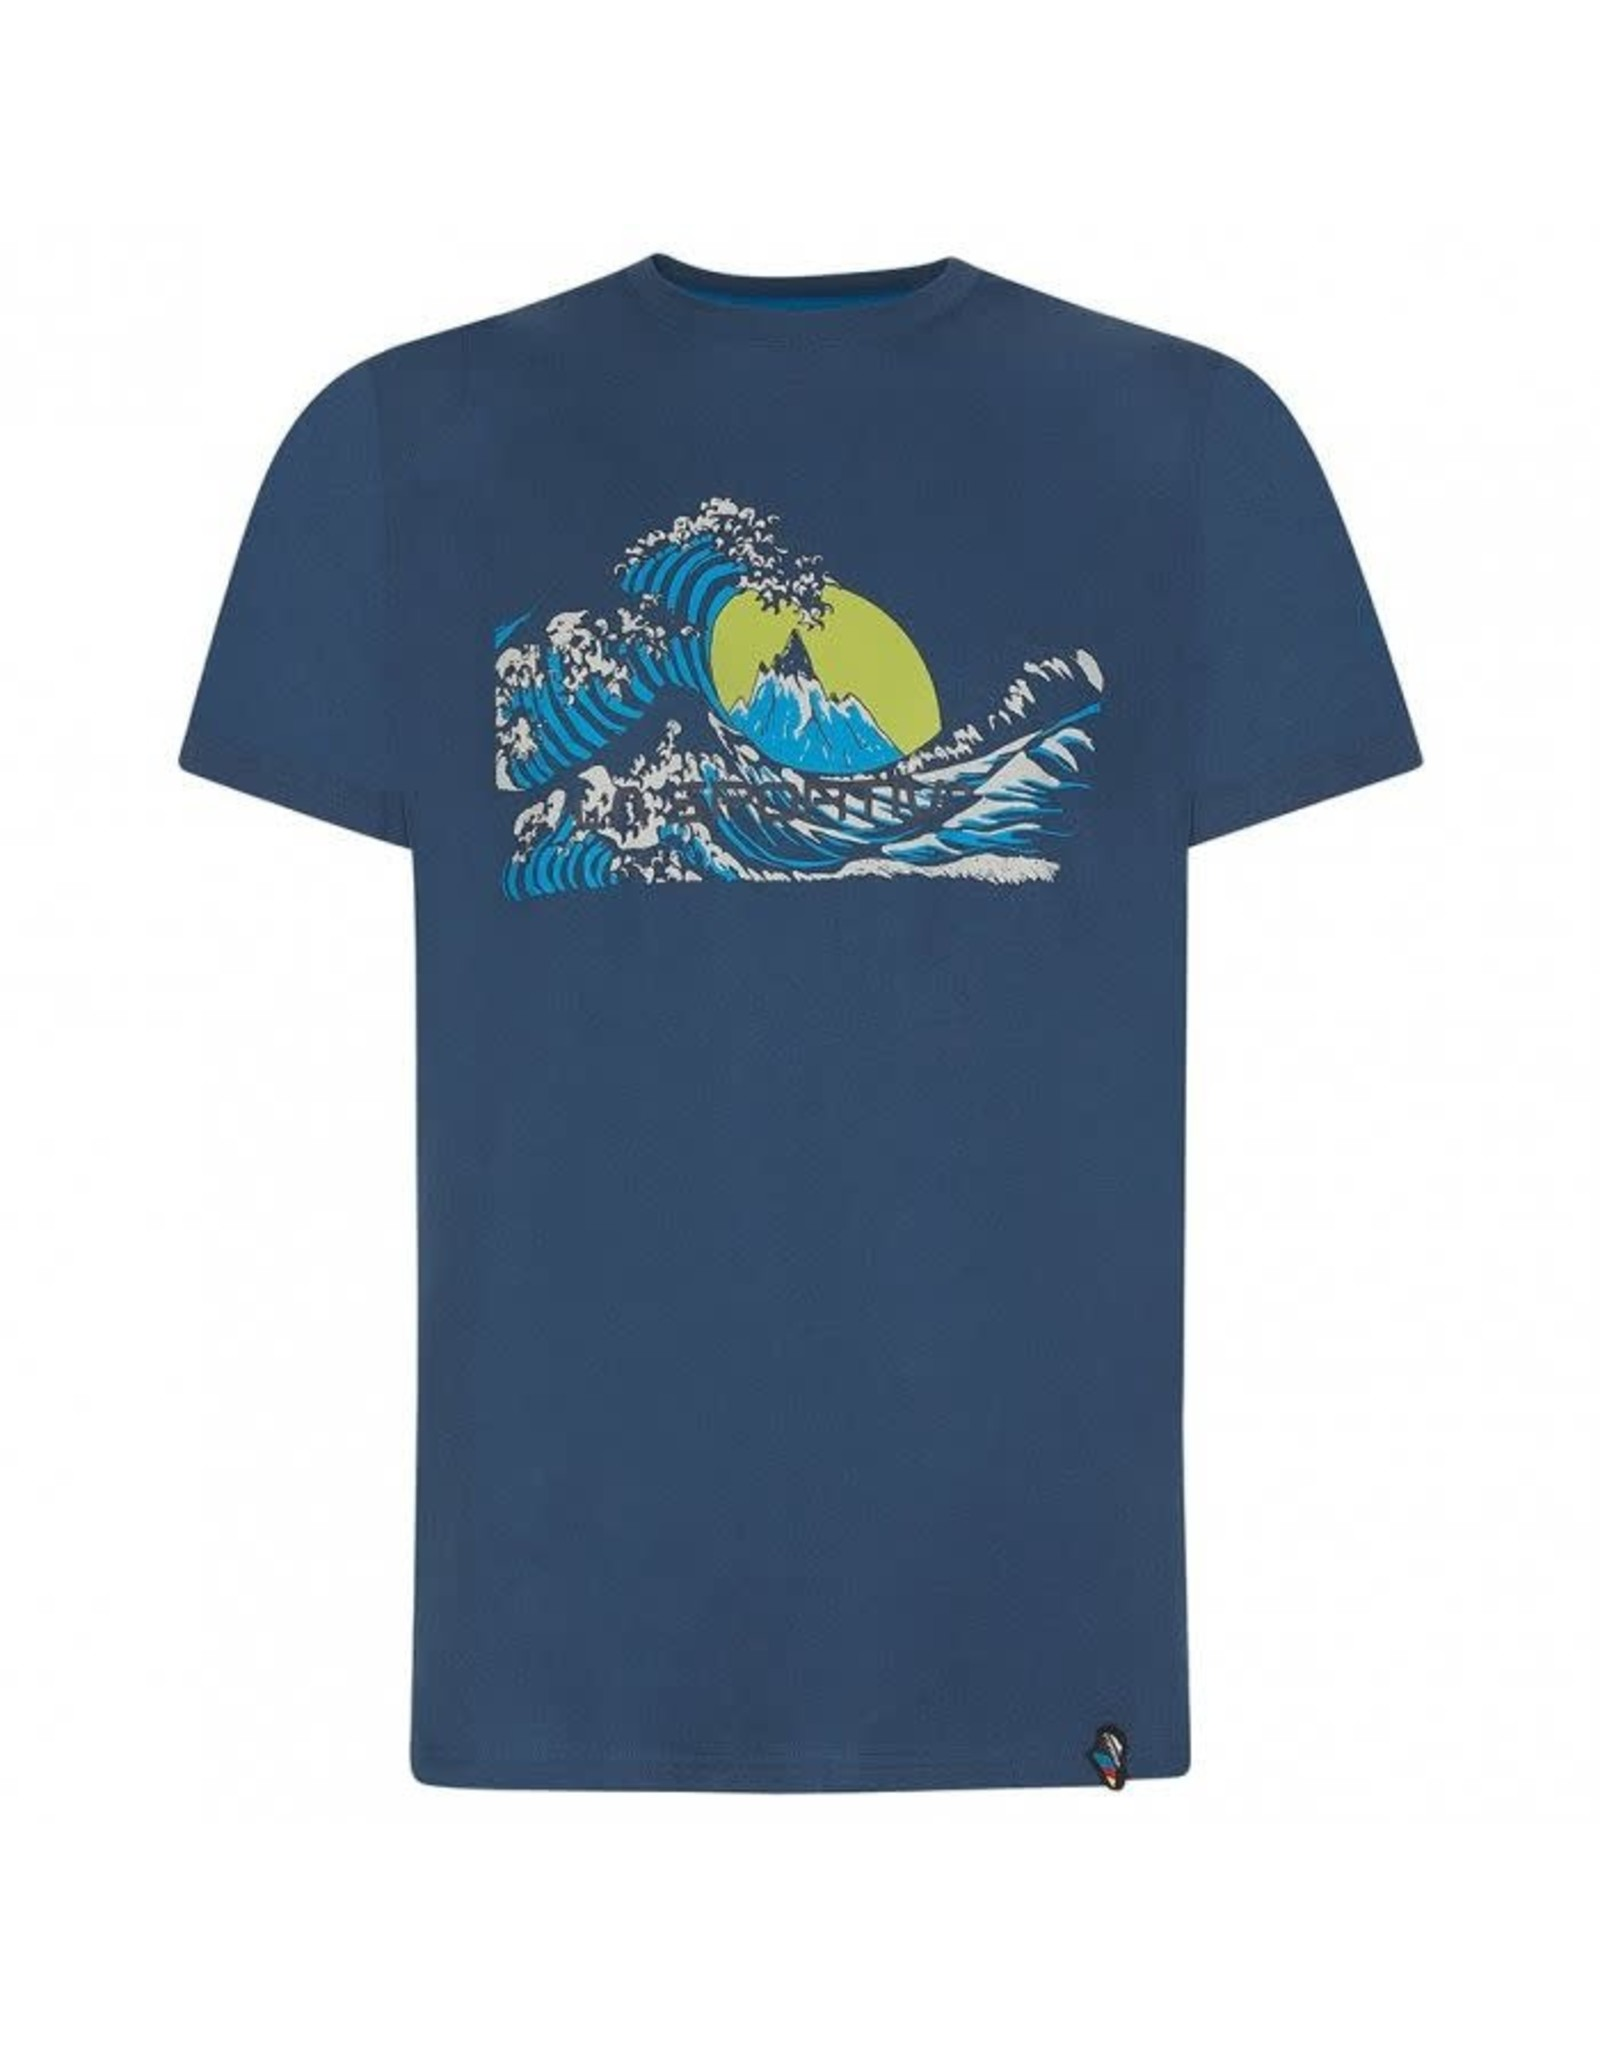 La Sportiva T-shirt La Sportiva Tokyo - Homme